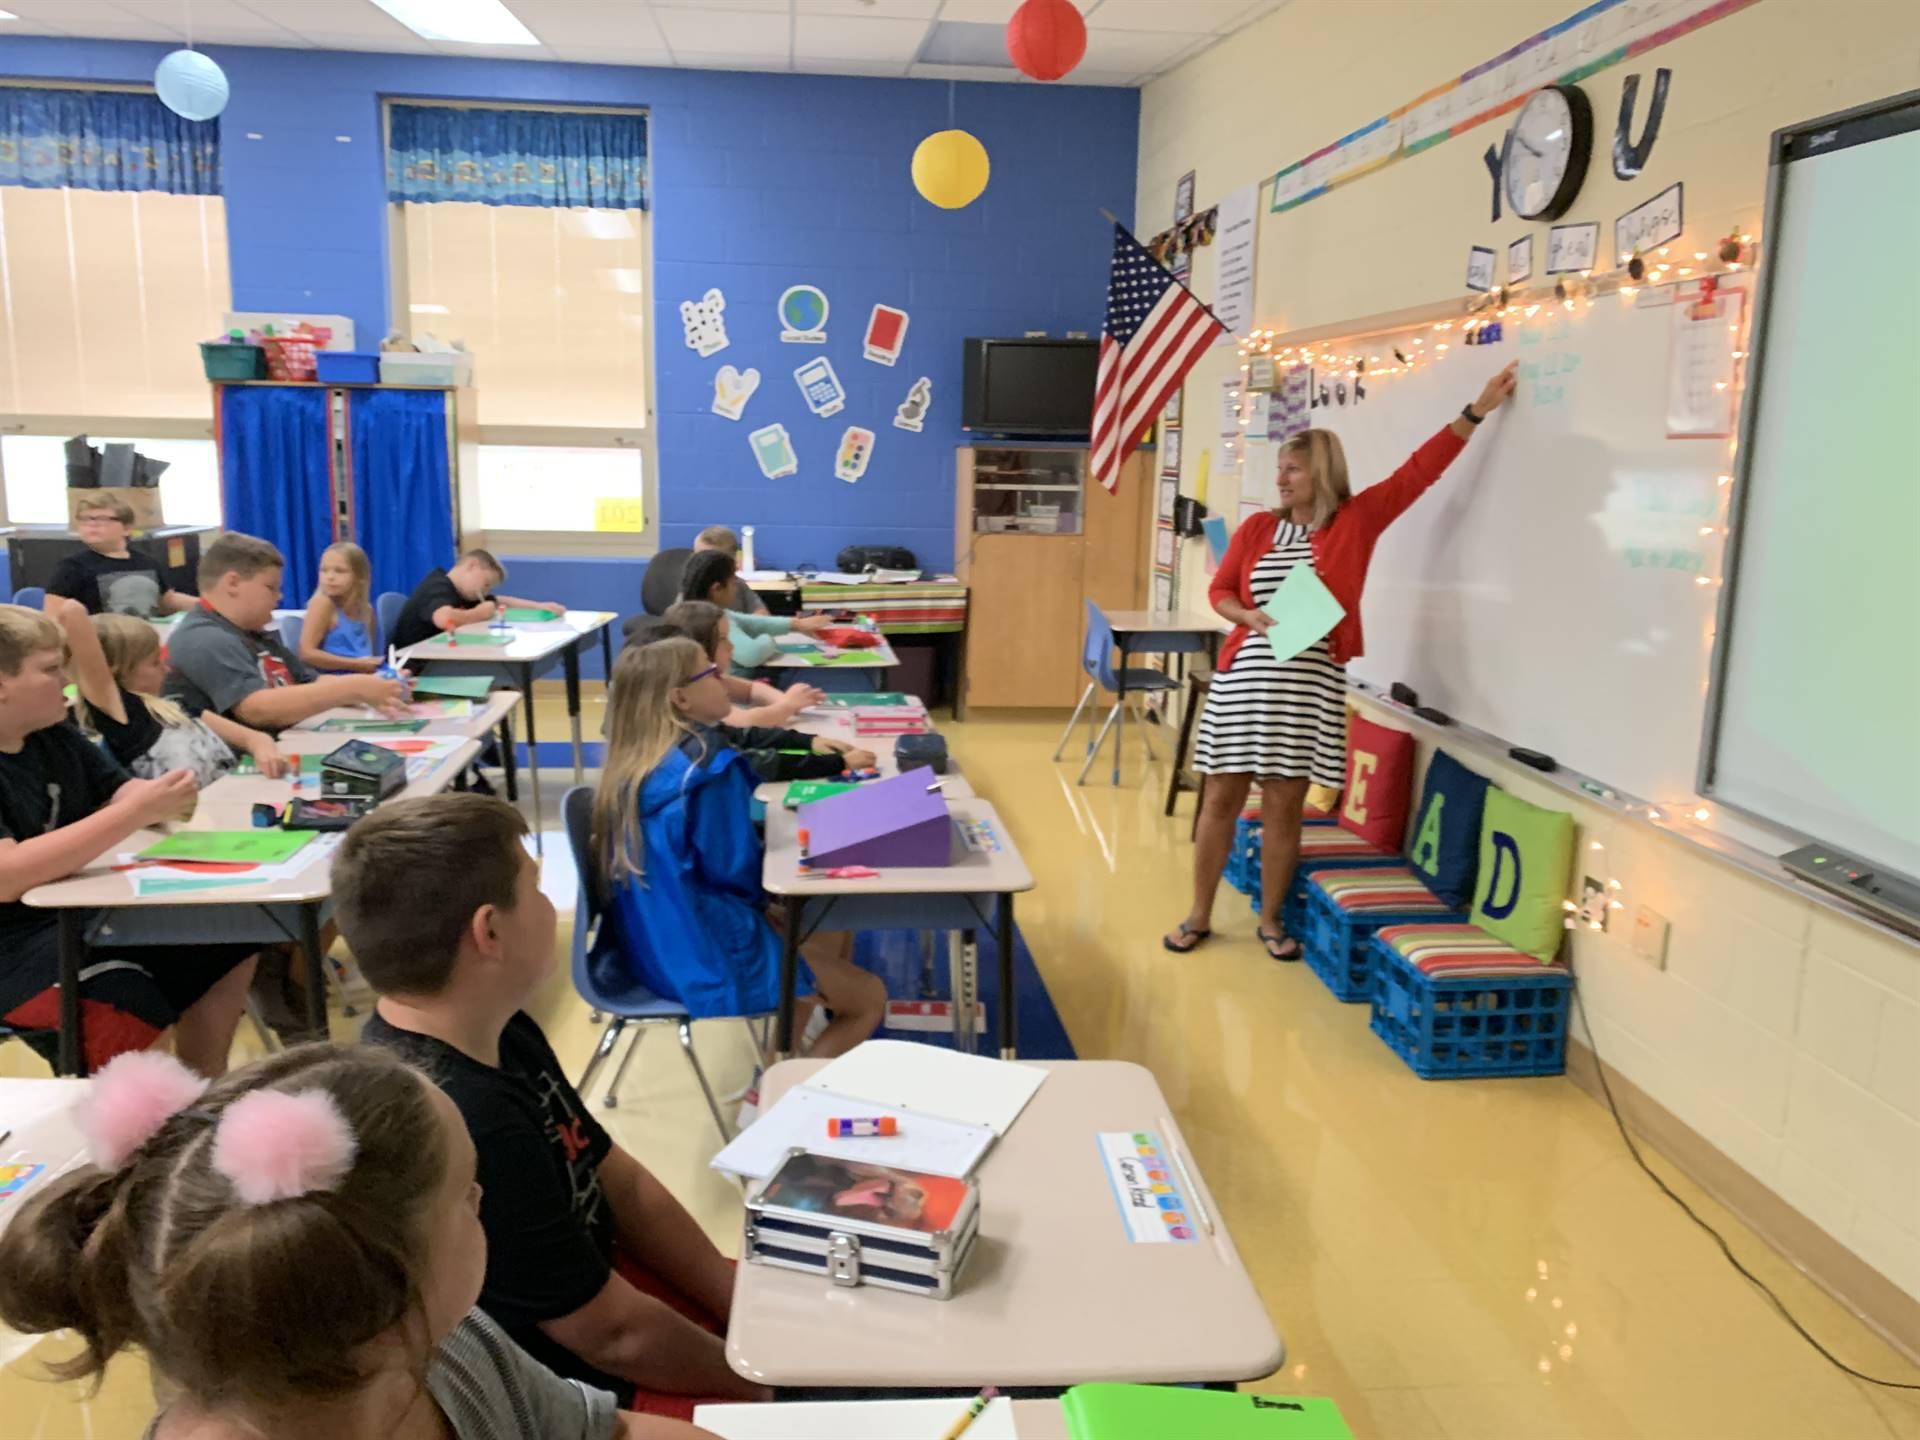 Mrs. Weymouth's classroom